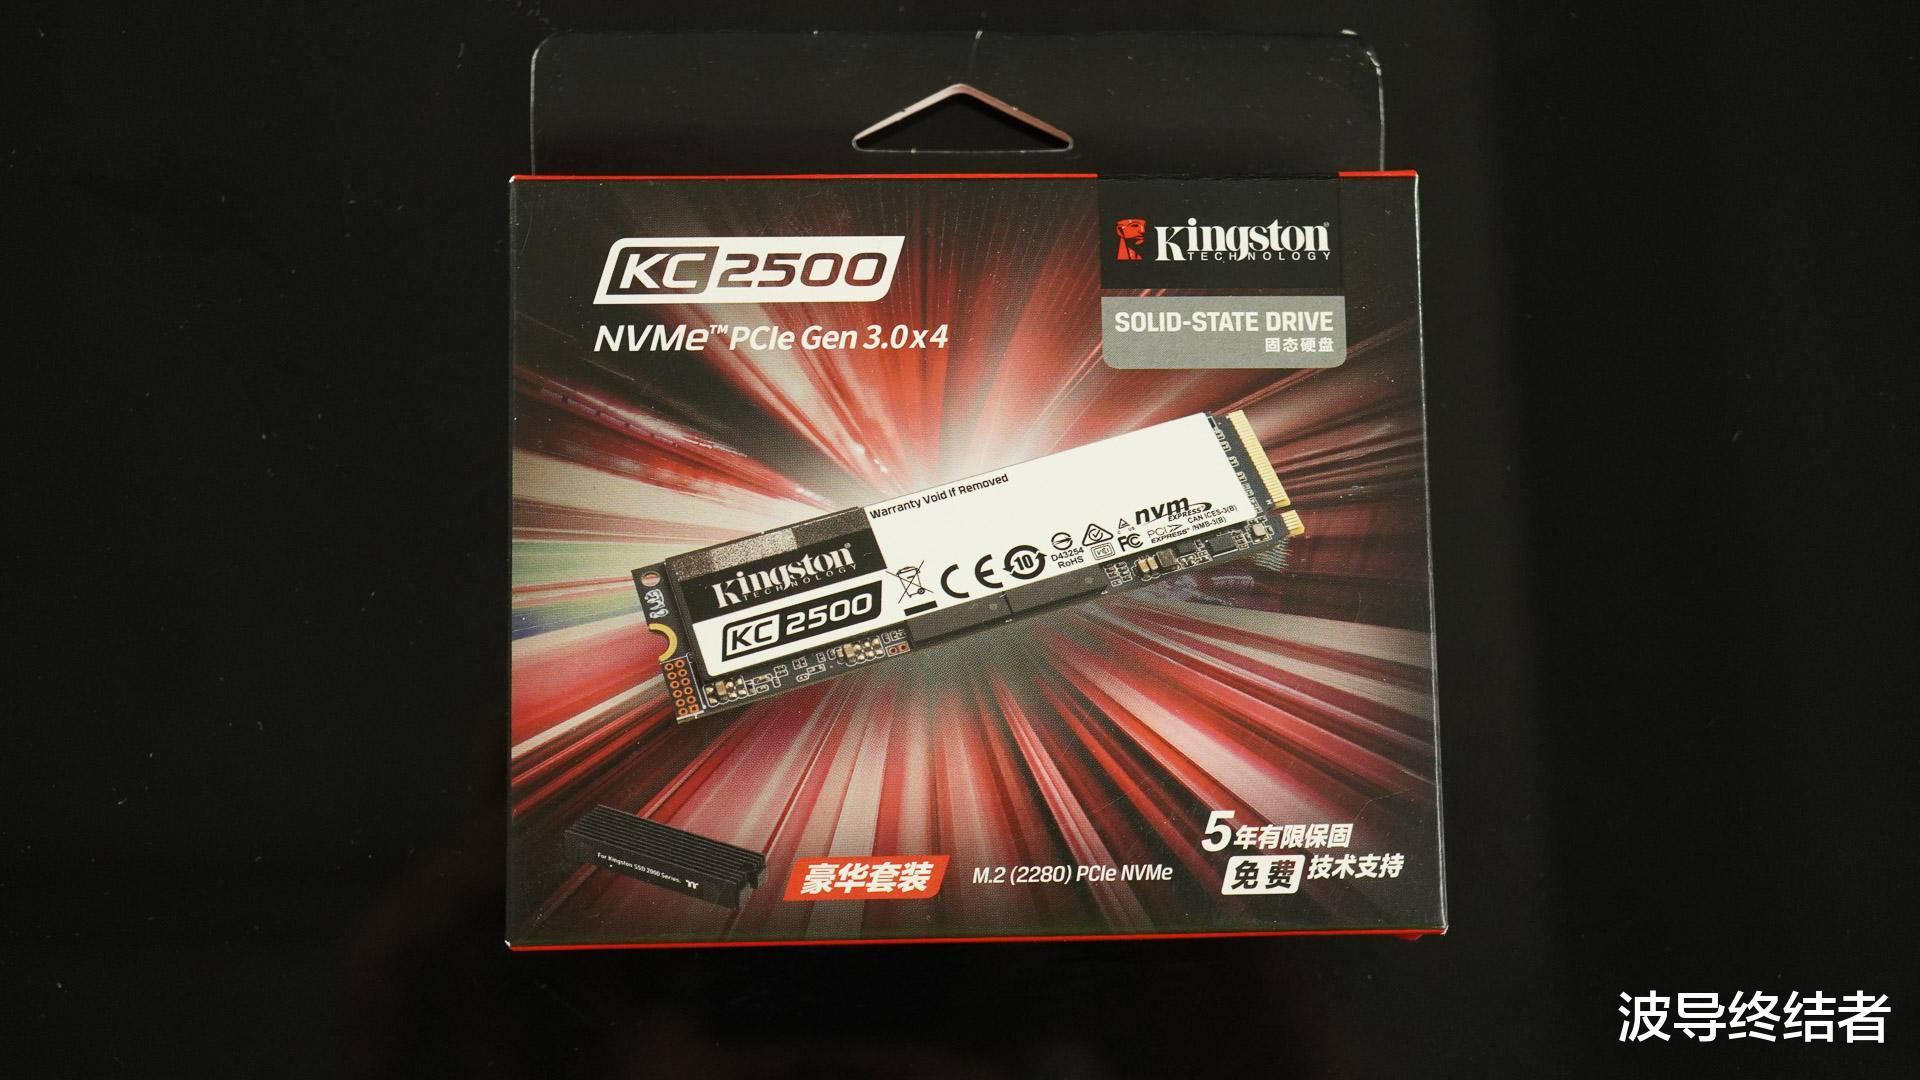 unturned合成_惊人的性能和热量控制 - 金士顿KC2500 SSD